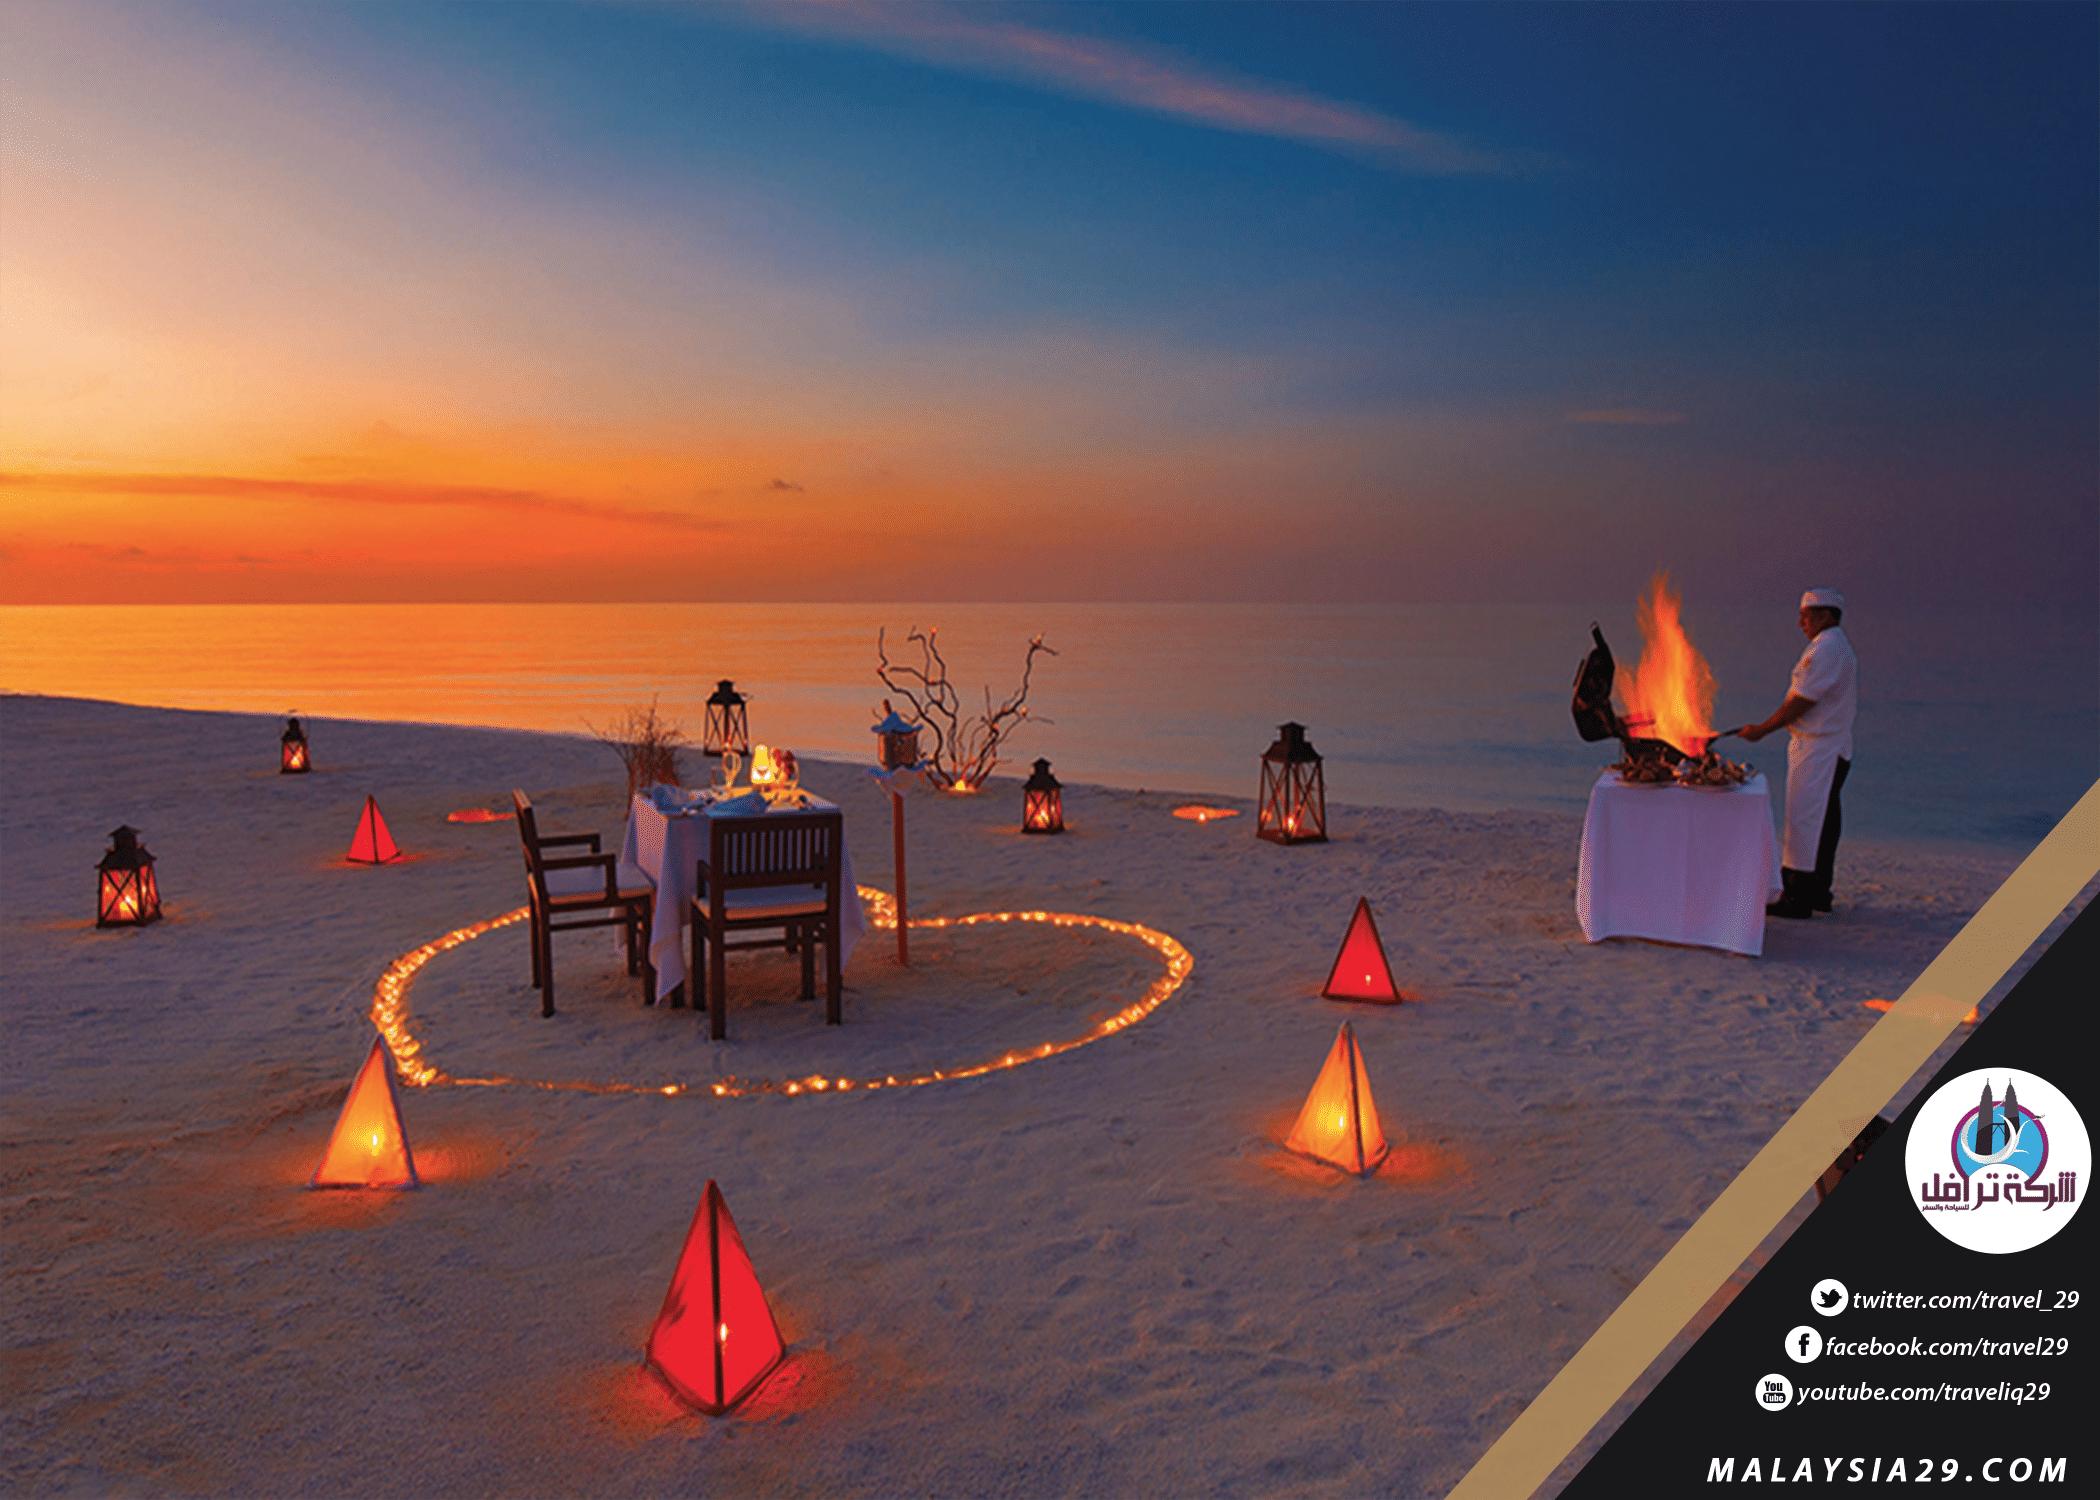 Romantic ambiance in the Maldives 2018